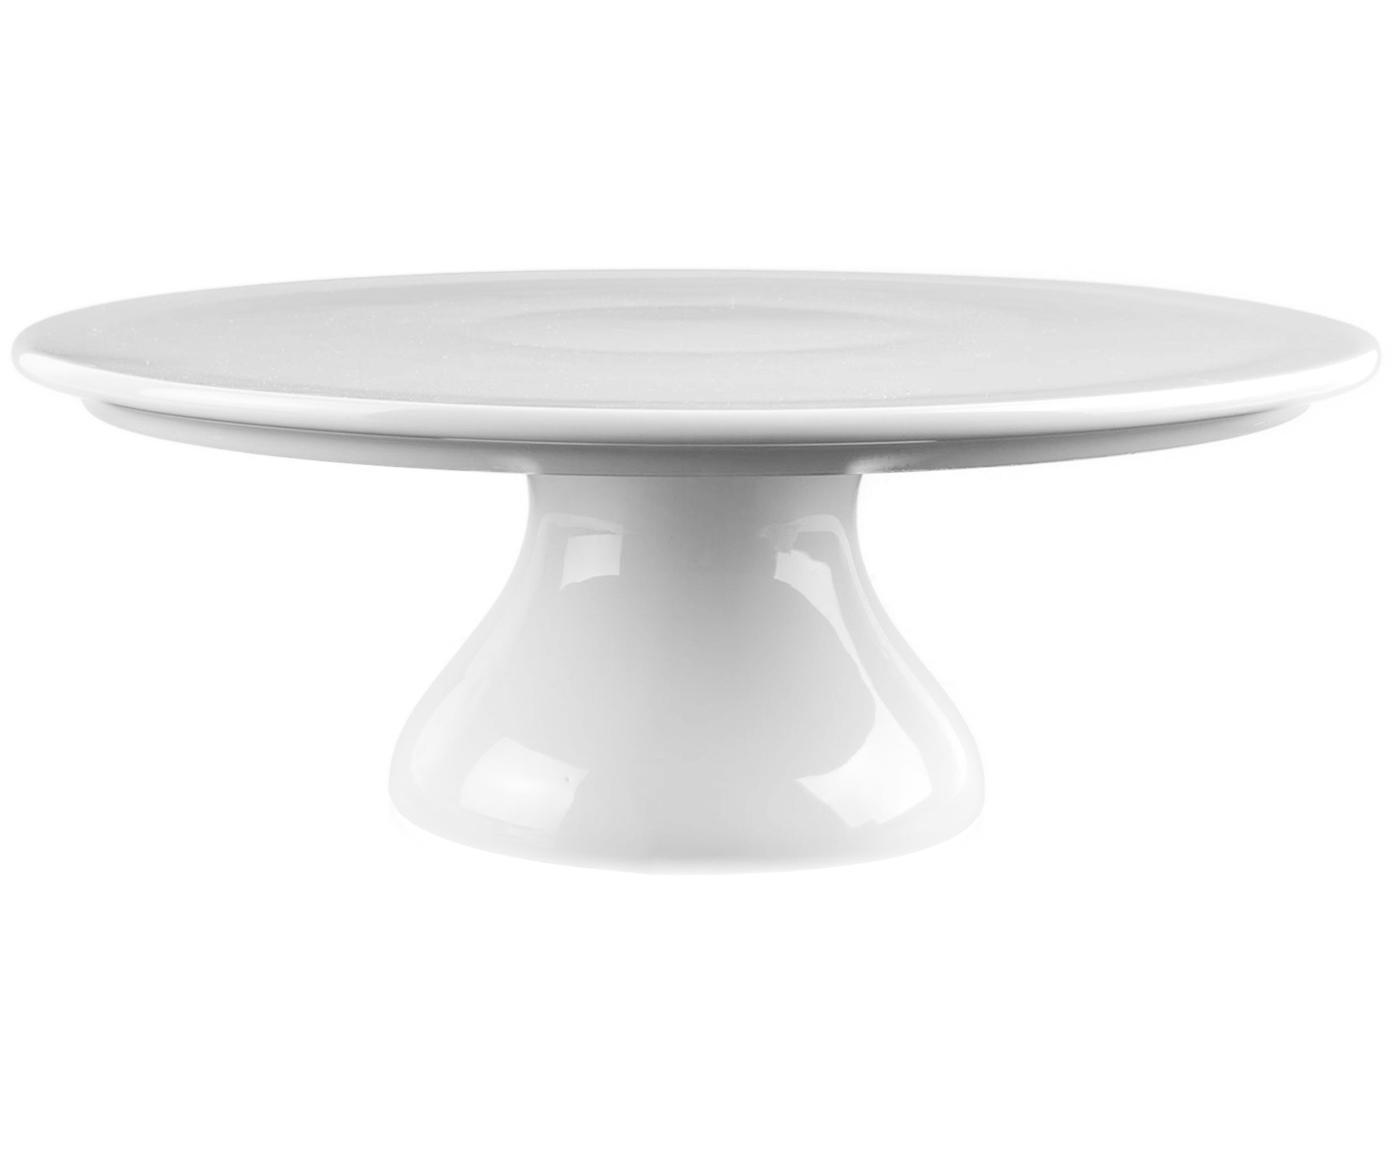 Tortenplatte Fonia, Porzellan, Weiß, Ø 25 x H 9 cm